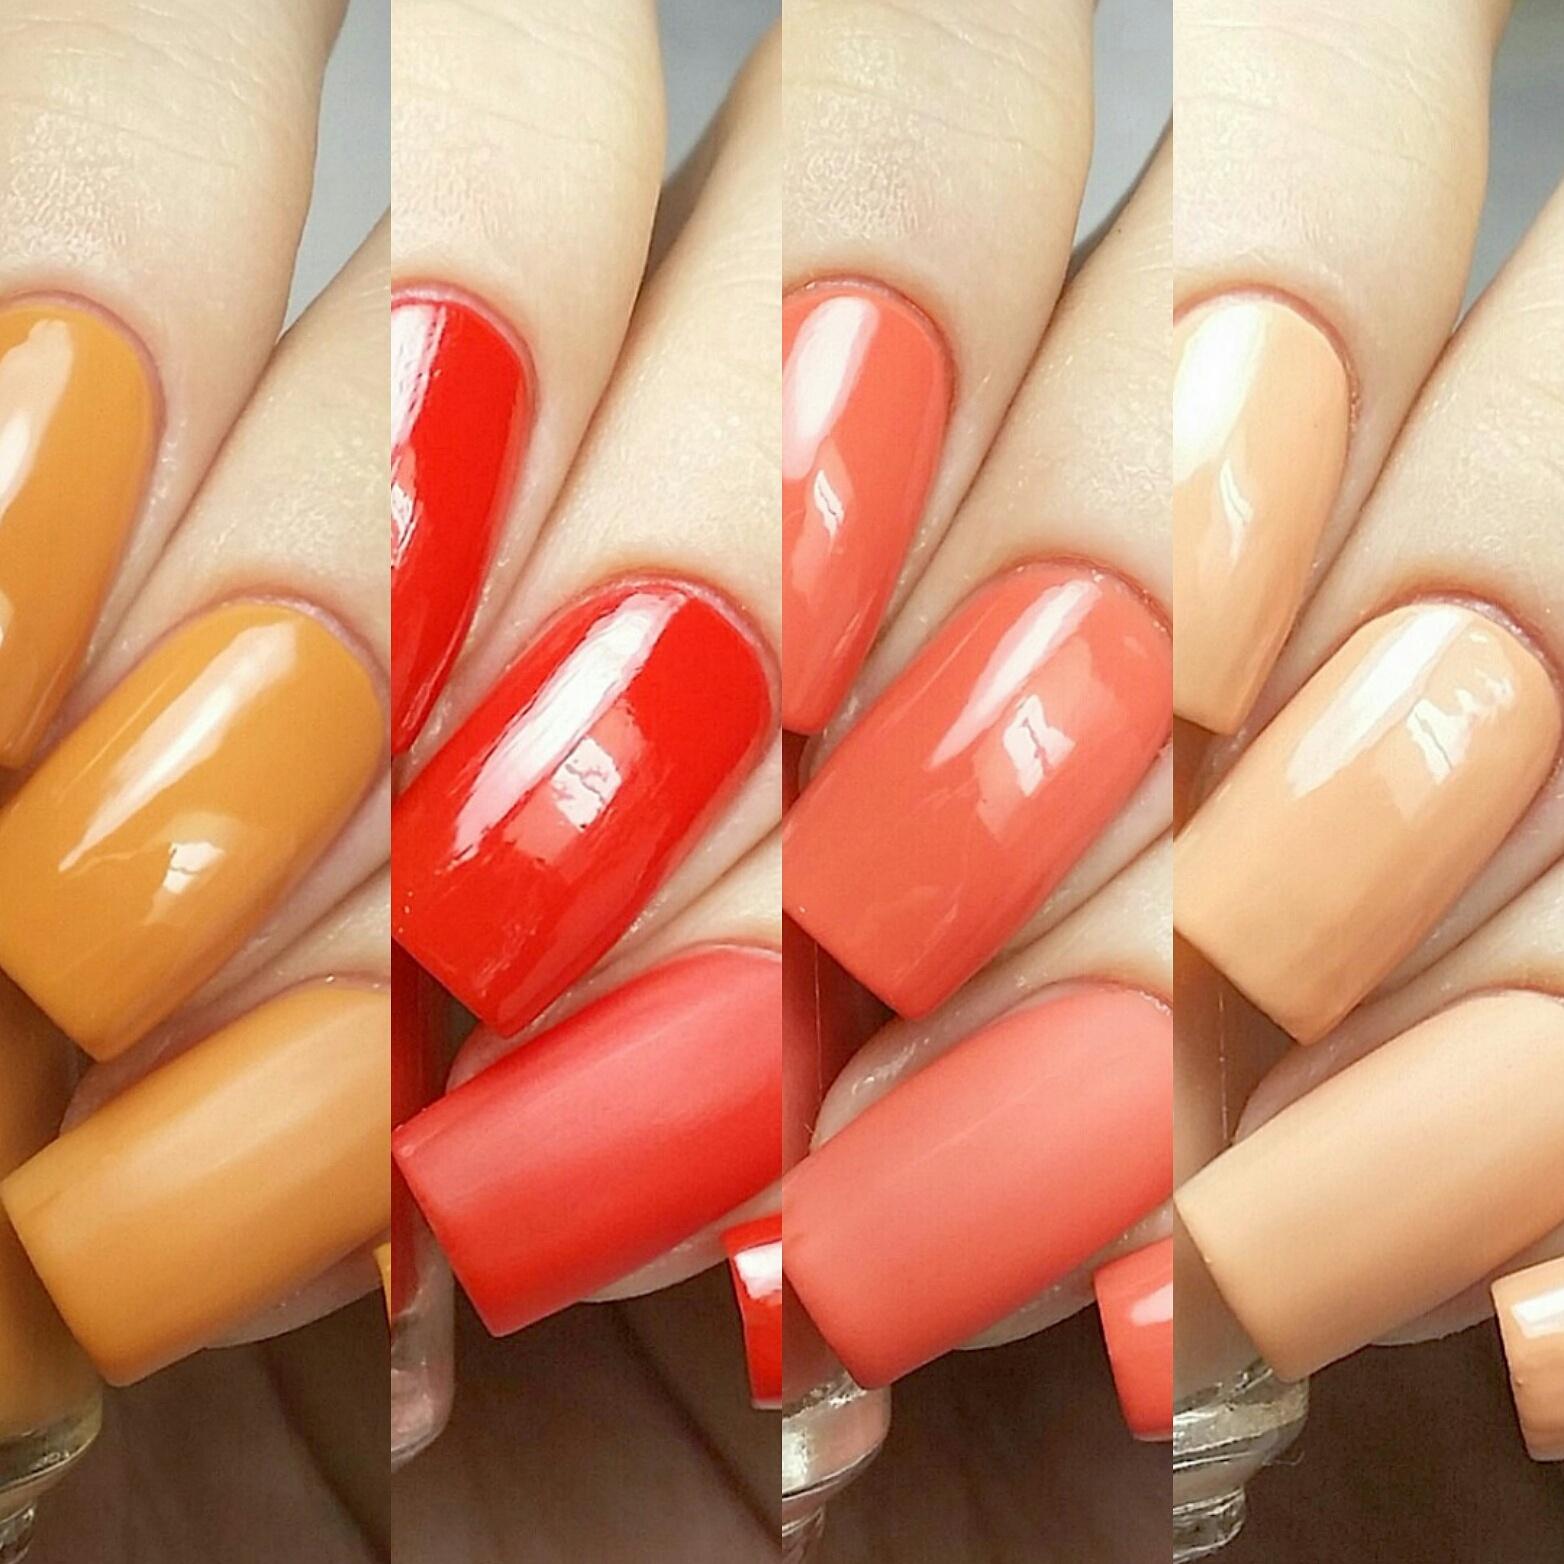 Kleighkat Nails: Weens Regular Nail Colors; Swatches & Reviews!